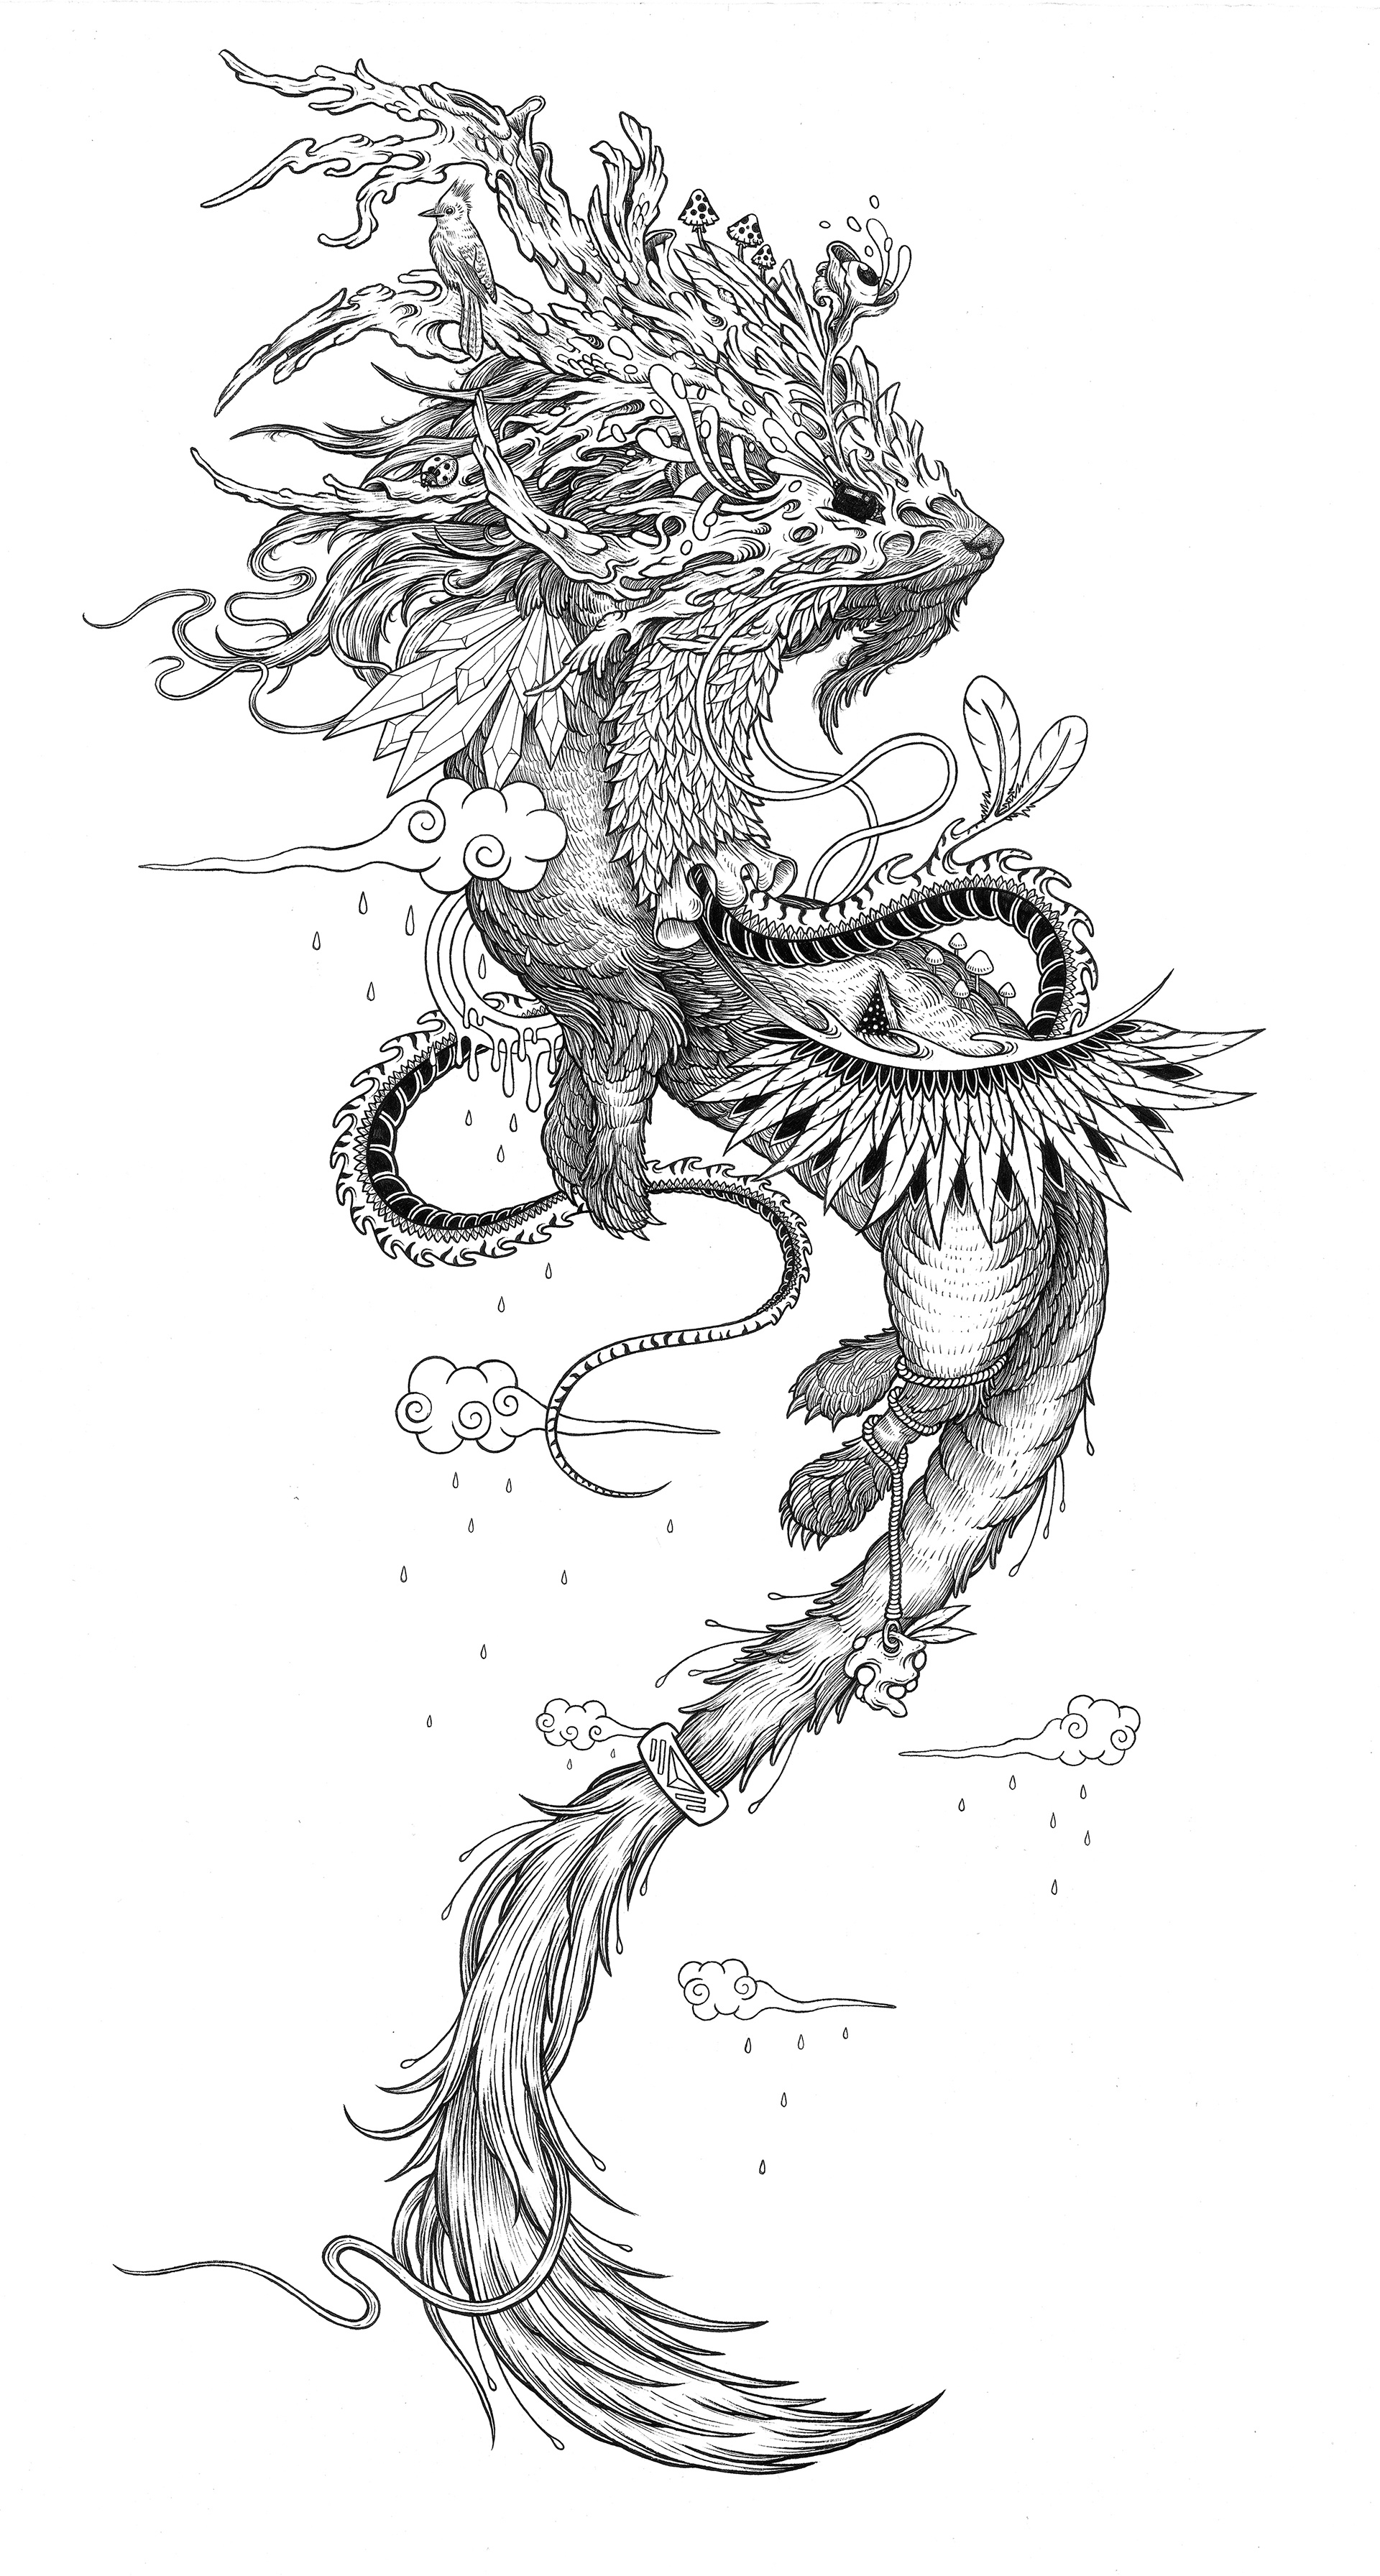 手绘山海经--灵兽插画 图形设计 手绘illustration, graphic design